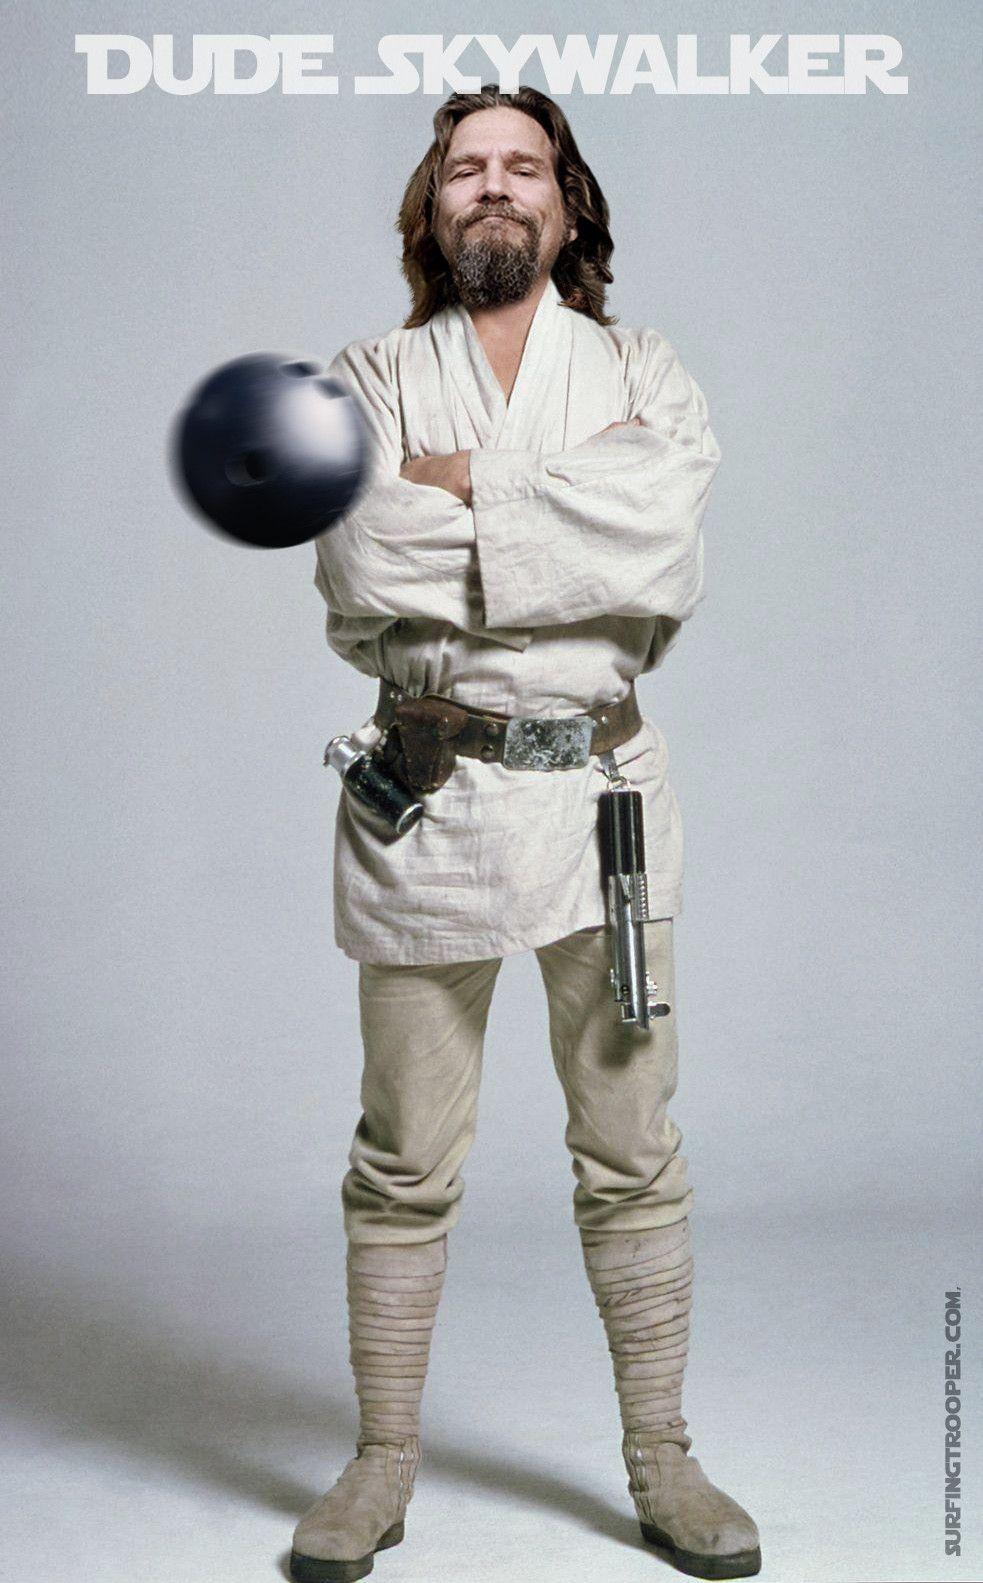 The Luke abides...